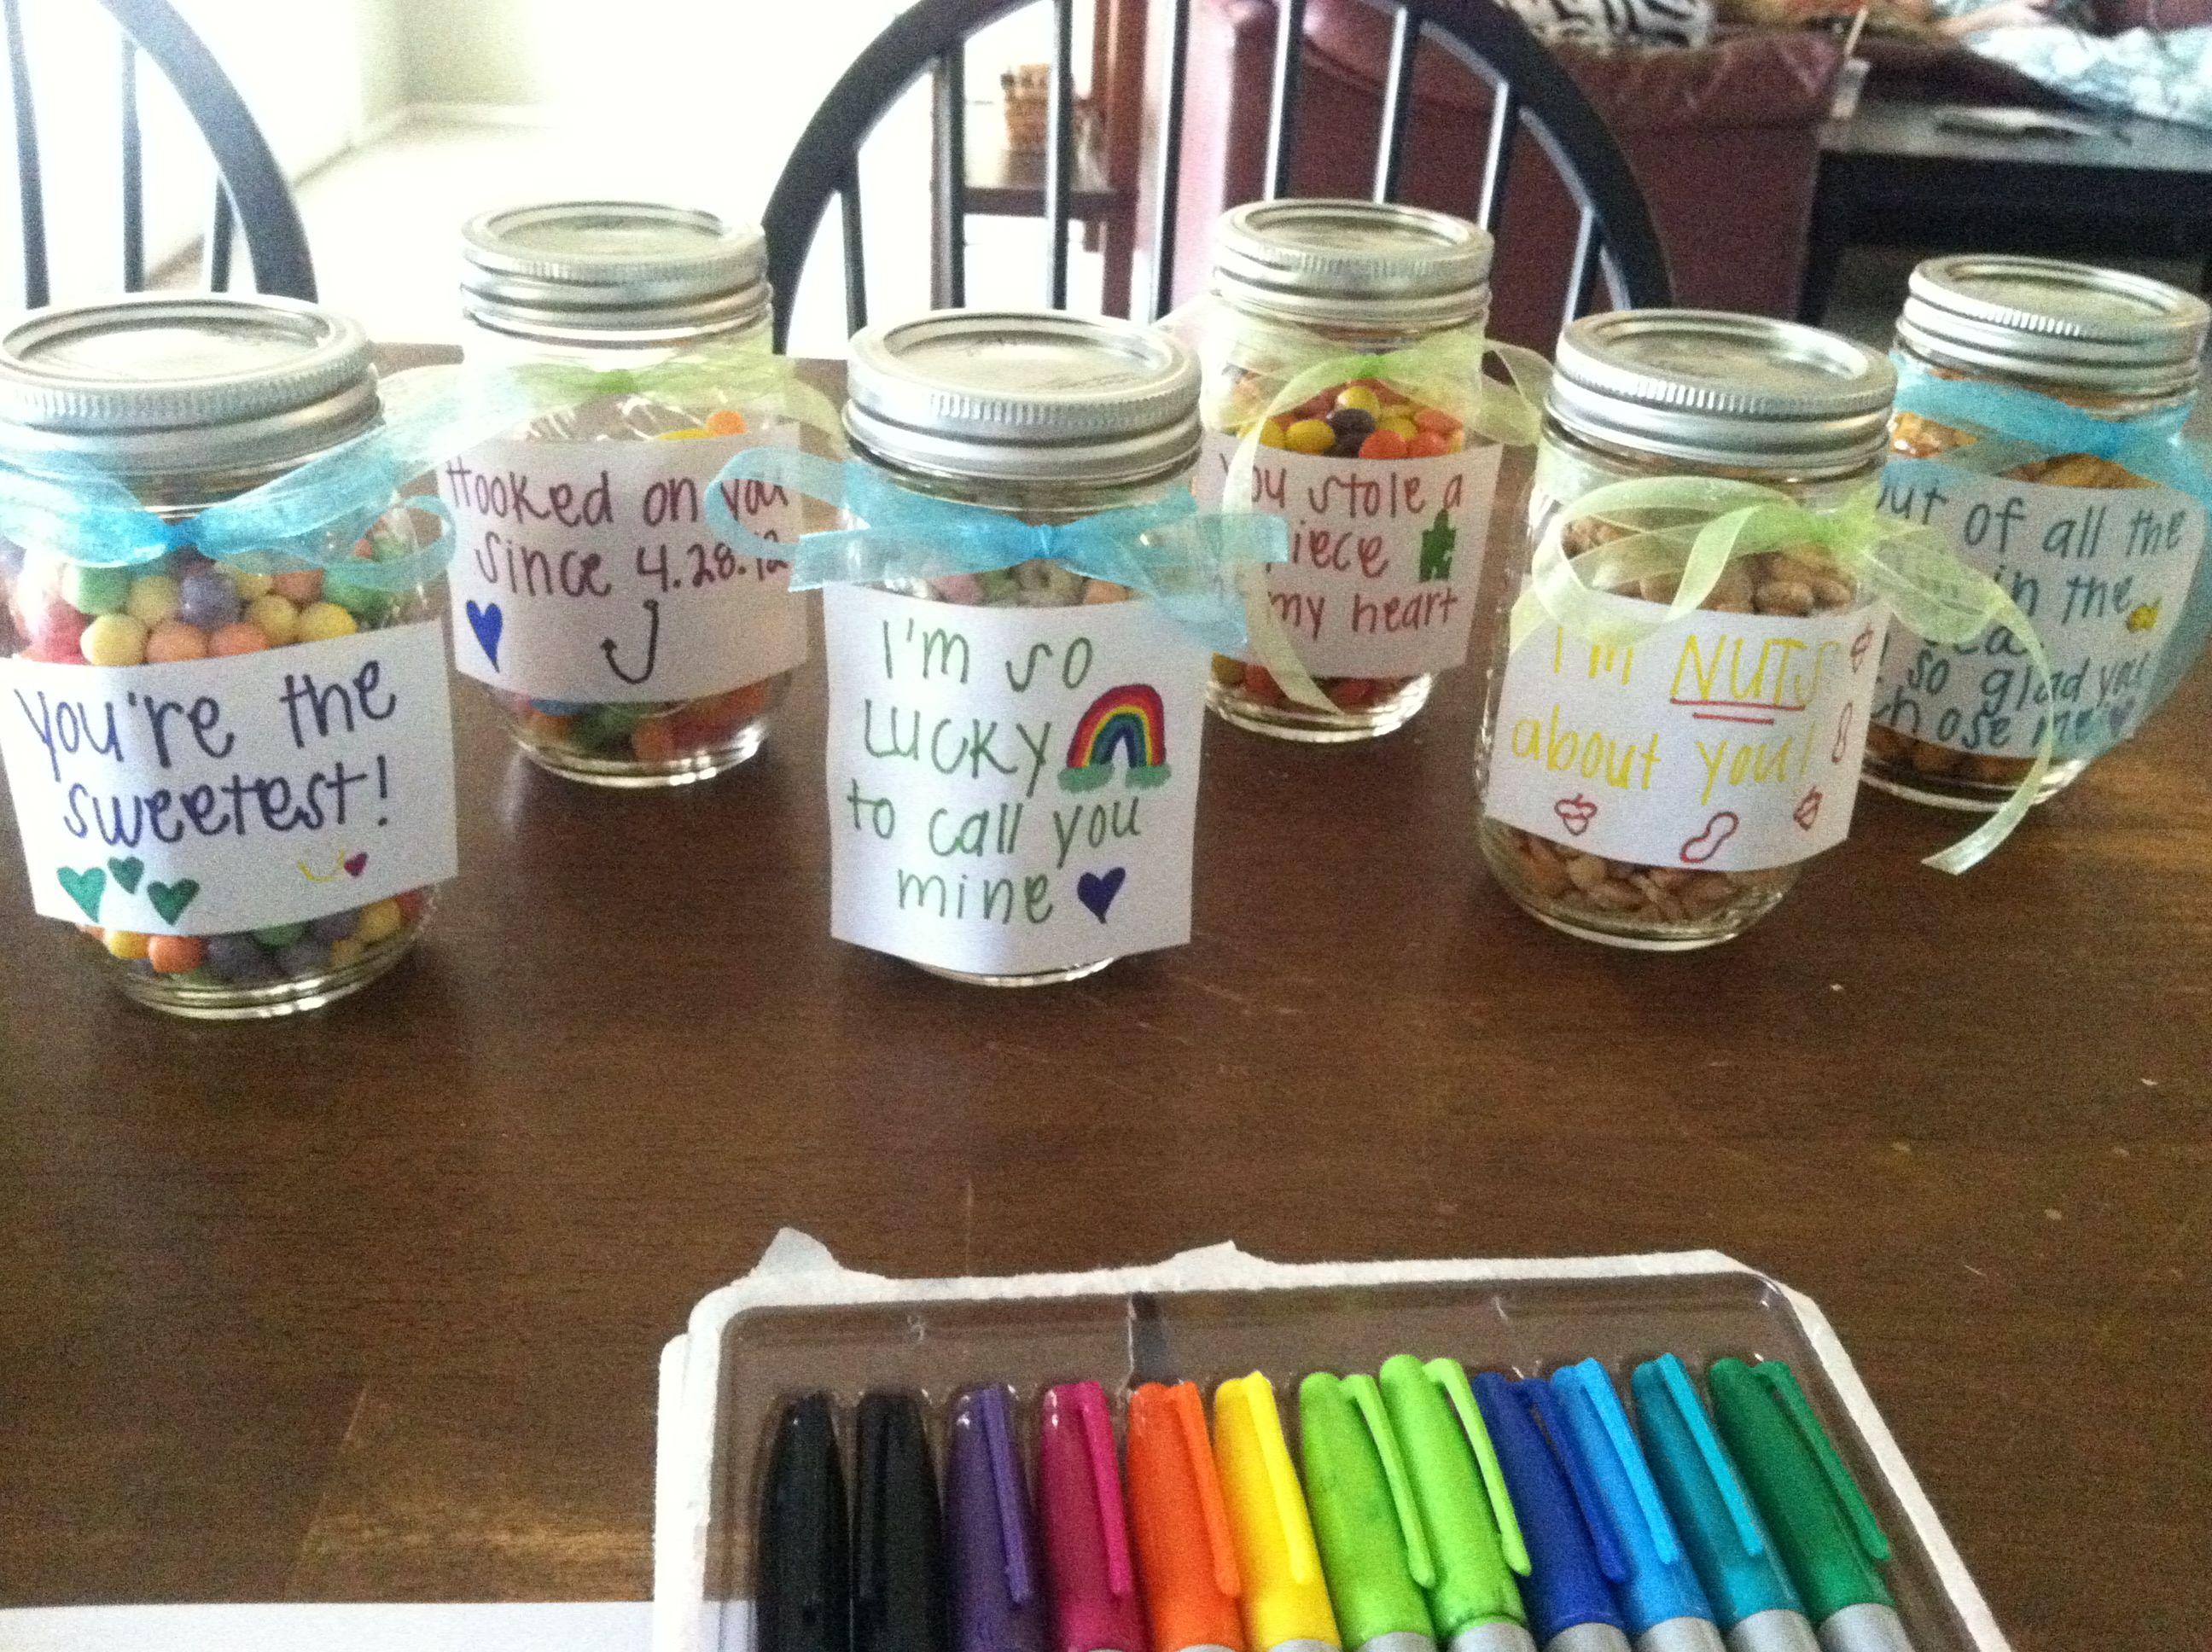 Cute gift idea for the boyfriend for an anniversary